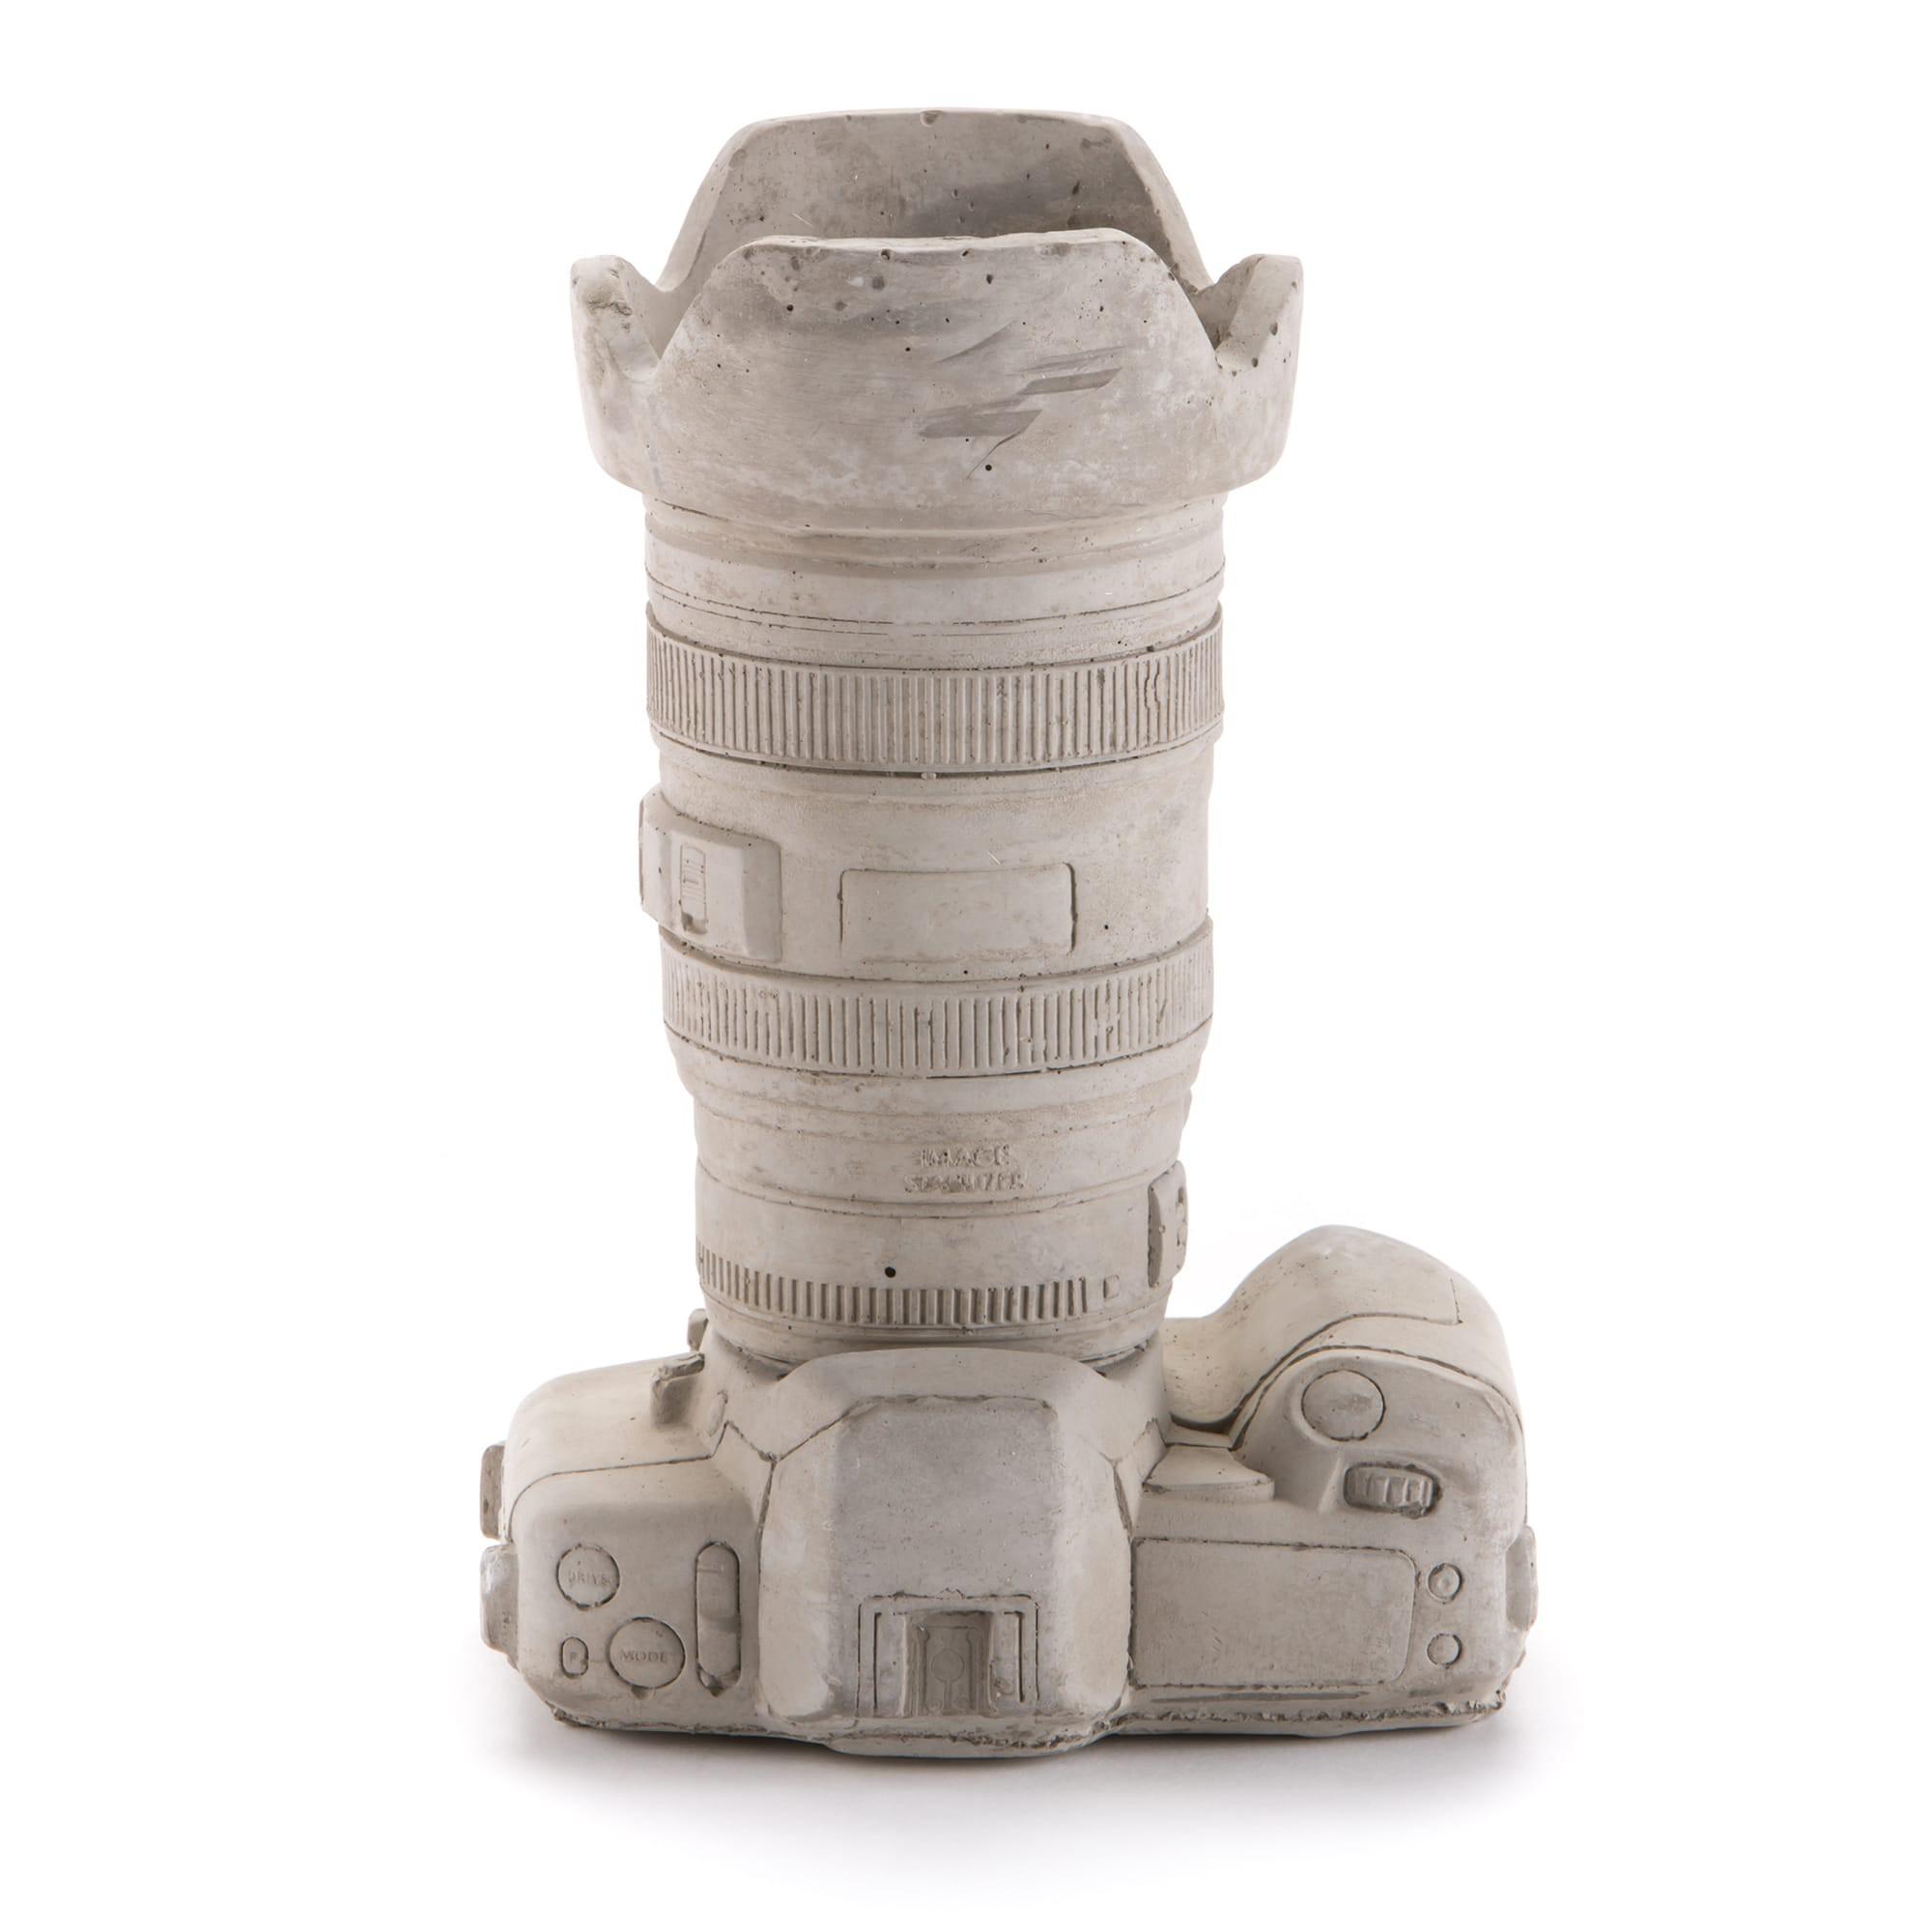 Concrete Vase #Camera2